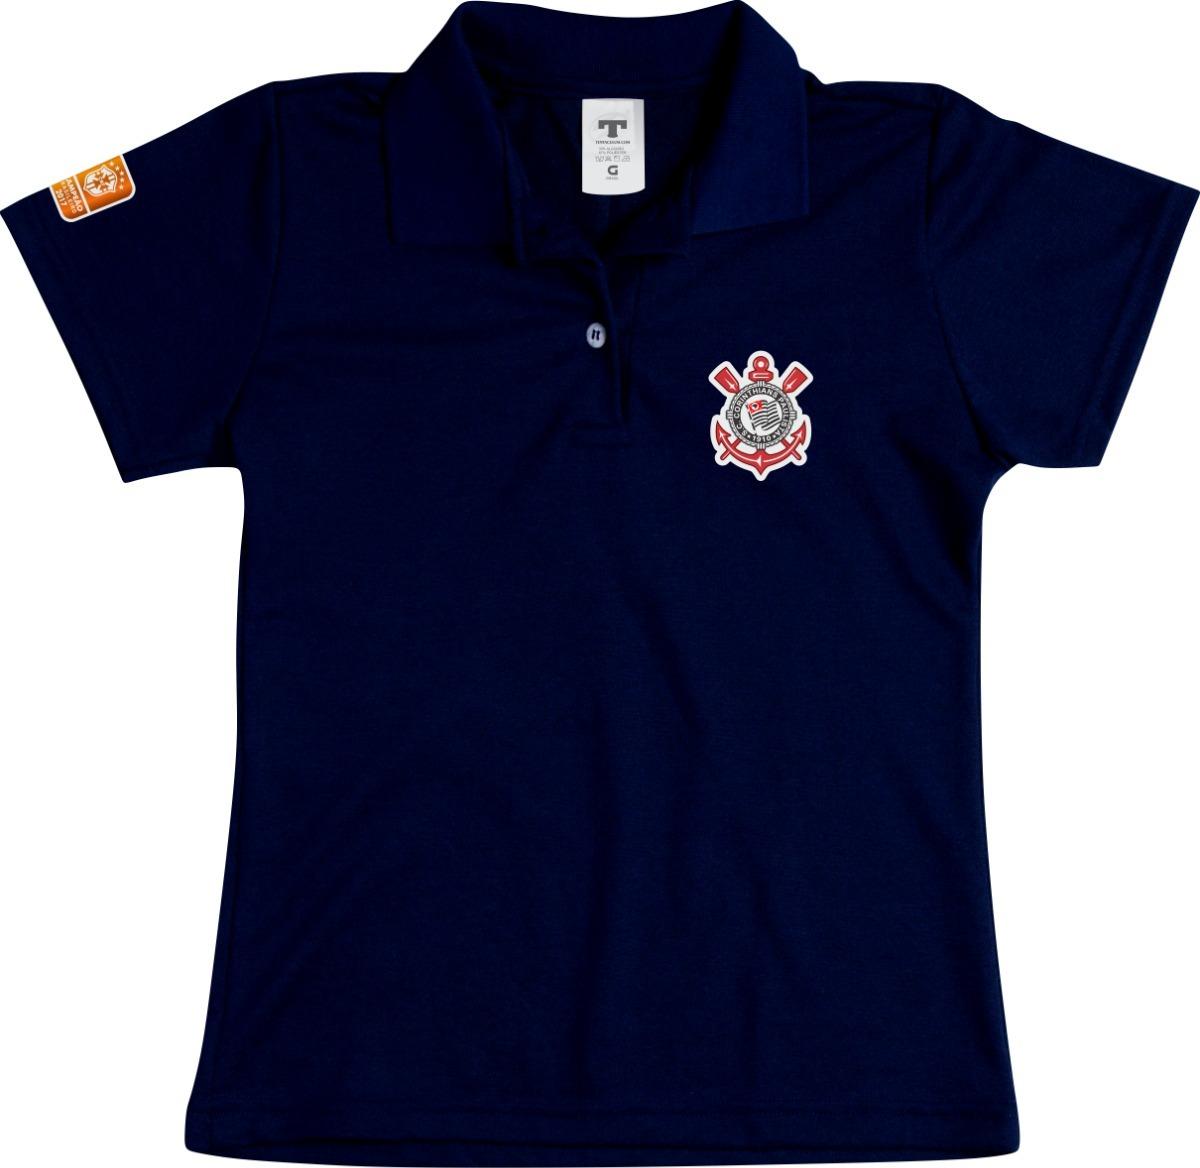 camisa polo feminina corinthians baby look especial preto. Carregando zoom. 9cd3cda748ba9